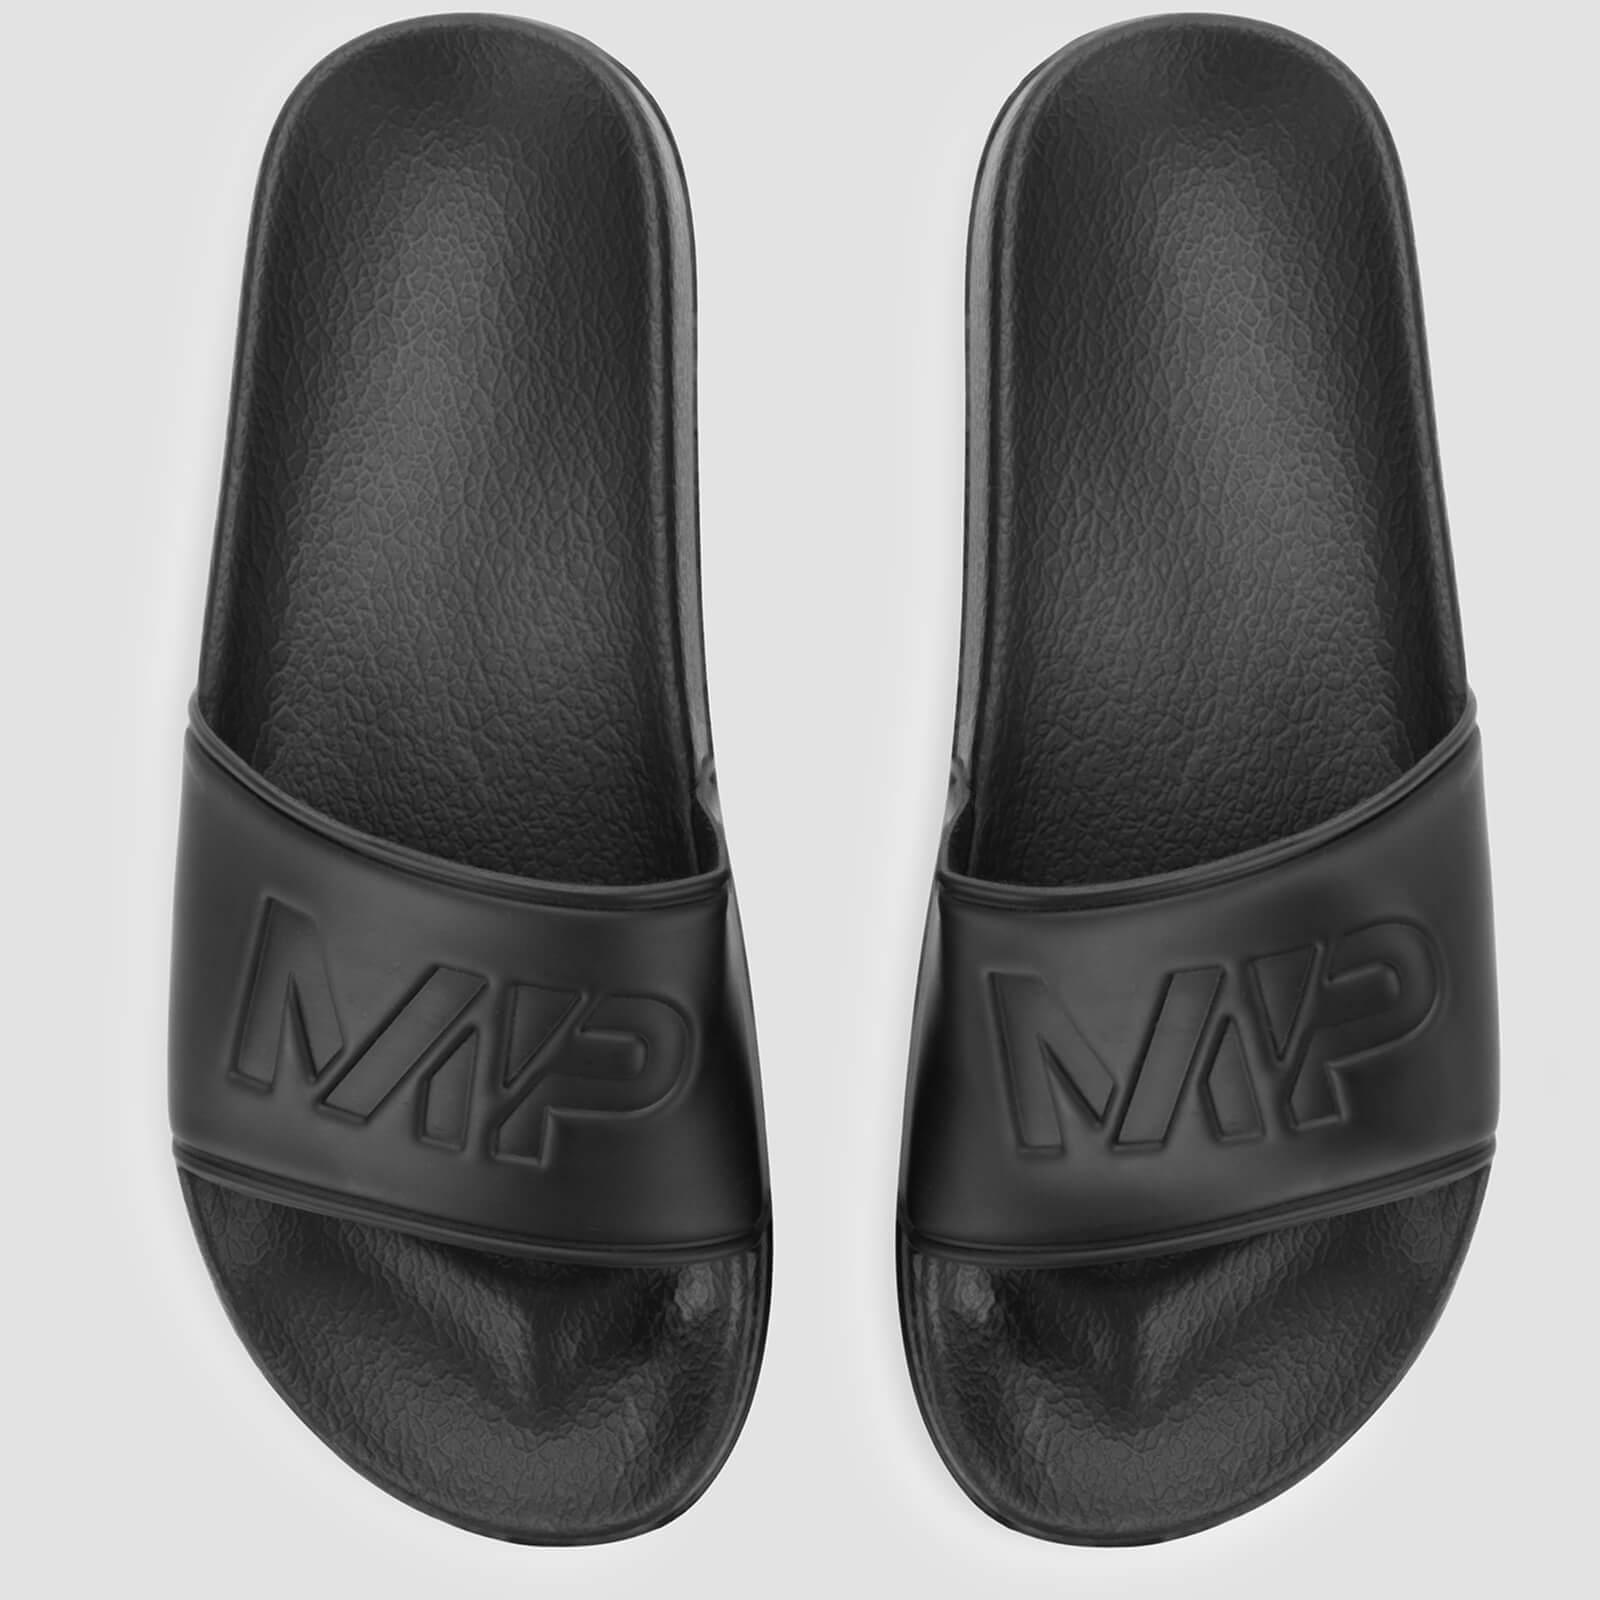 Myprotein MP Men's Sliders - Black - UK 9